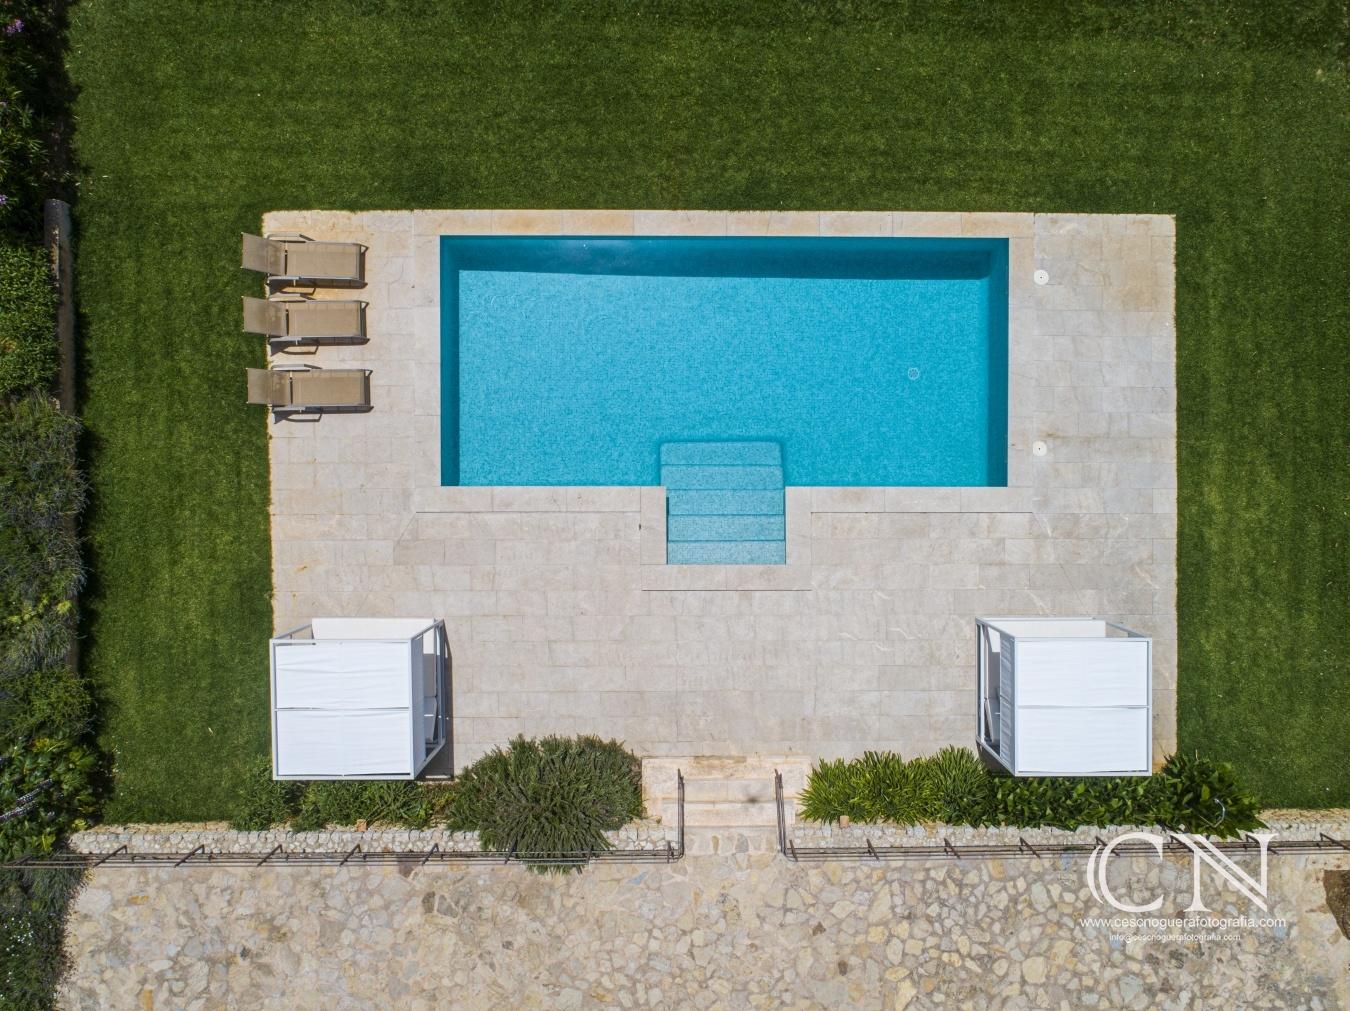 Fotografia aèria  - Cesc Noguera Fotografia,  Architectural & Interior design photographer / Landscape Photography.